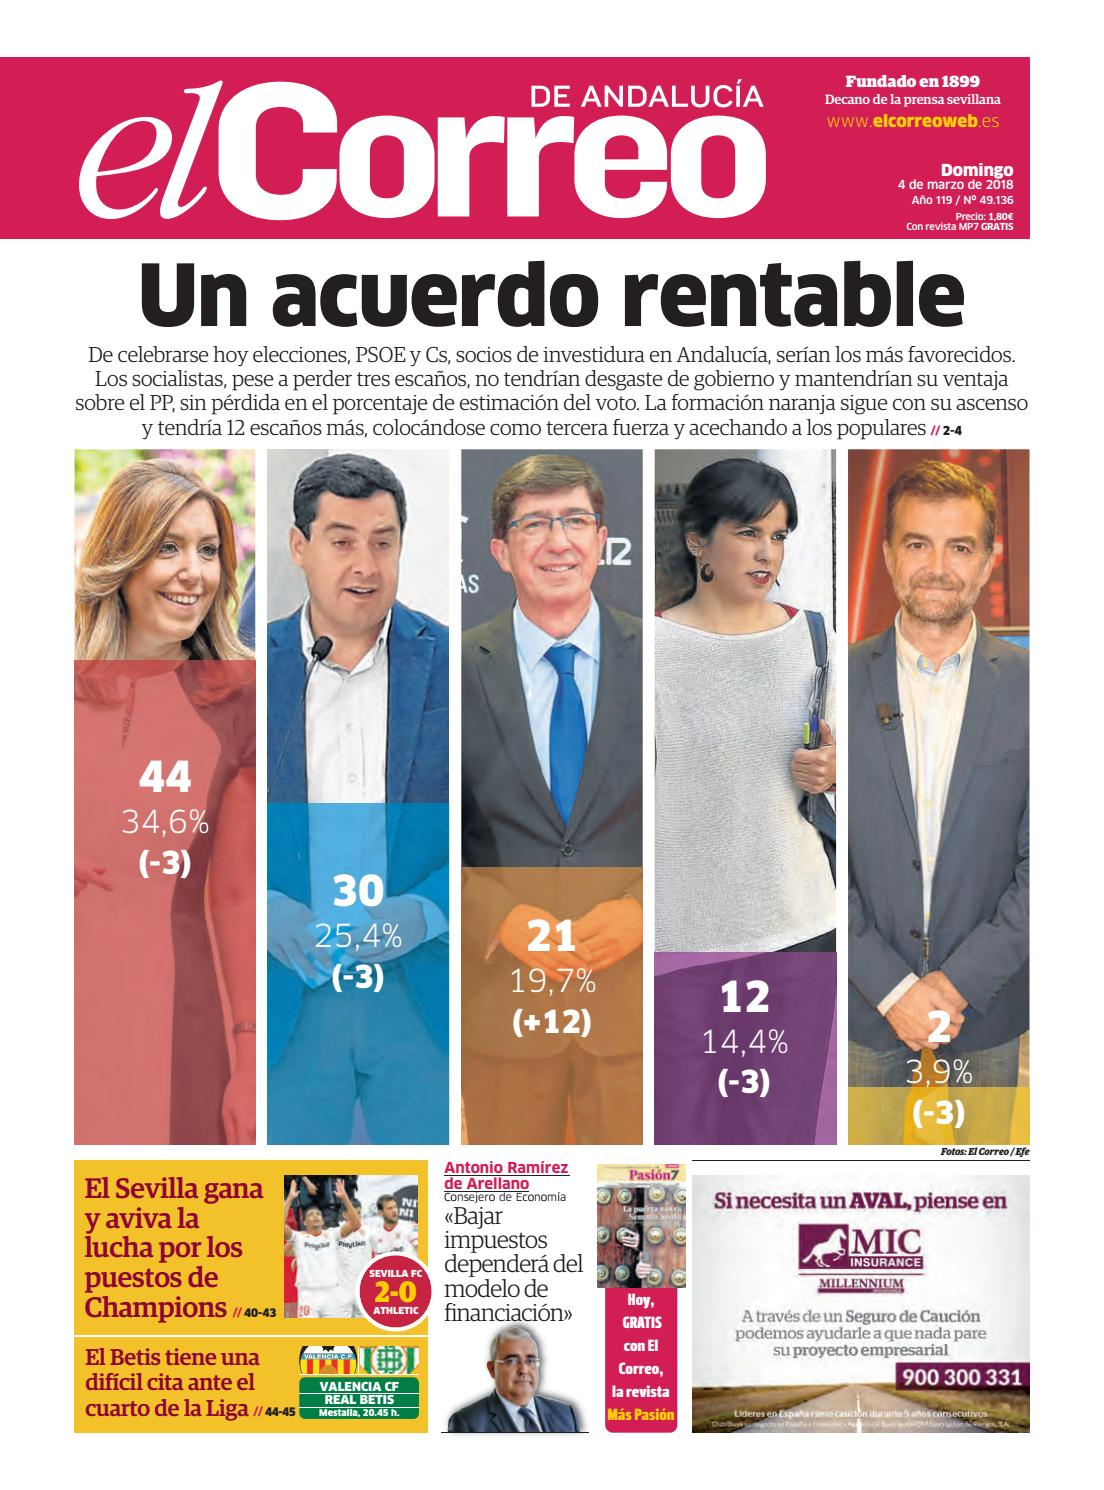 04 03 2018 El Correo De Andaluc A By El Correo De Andaluc A S L  # Muebles Kostic Palencia